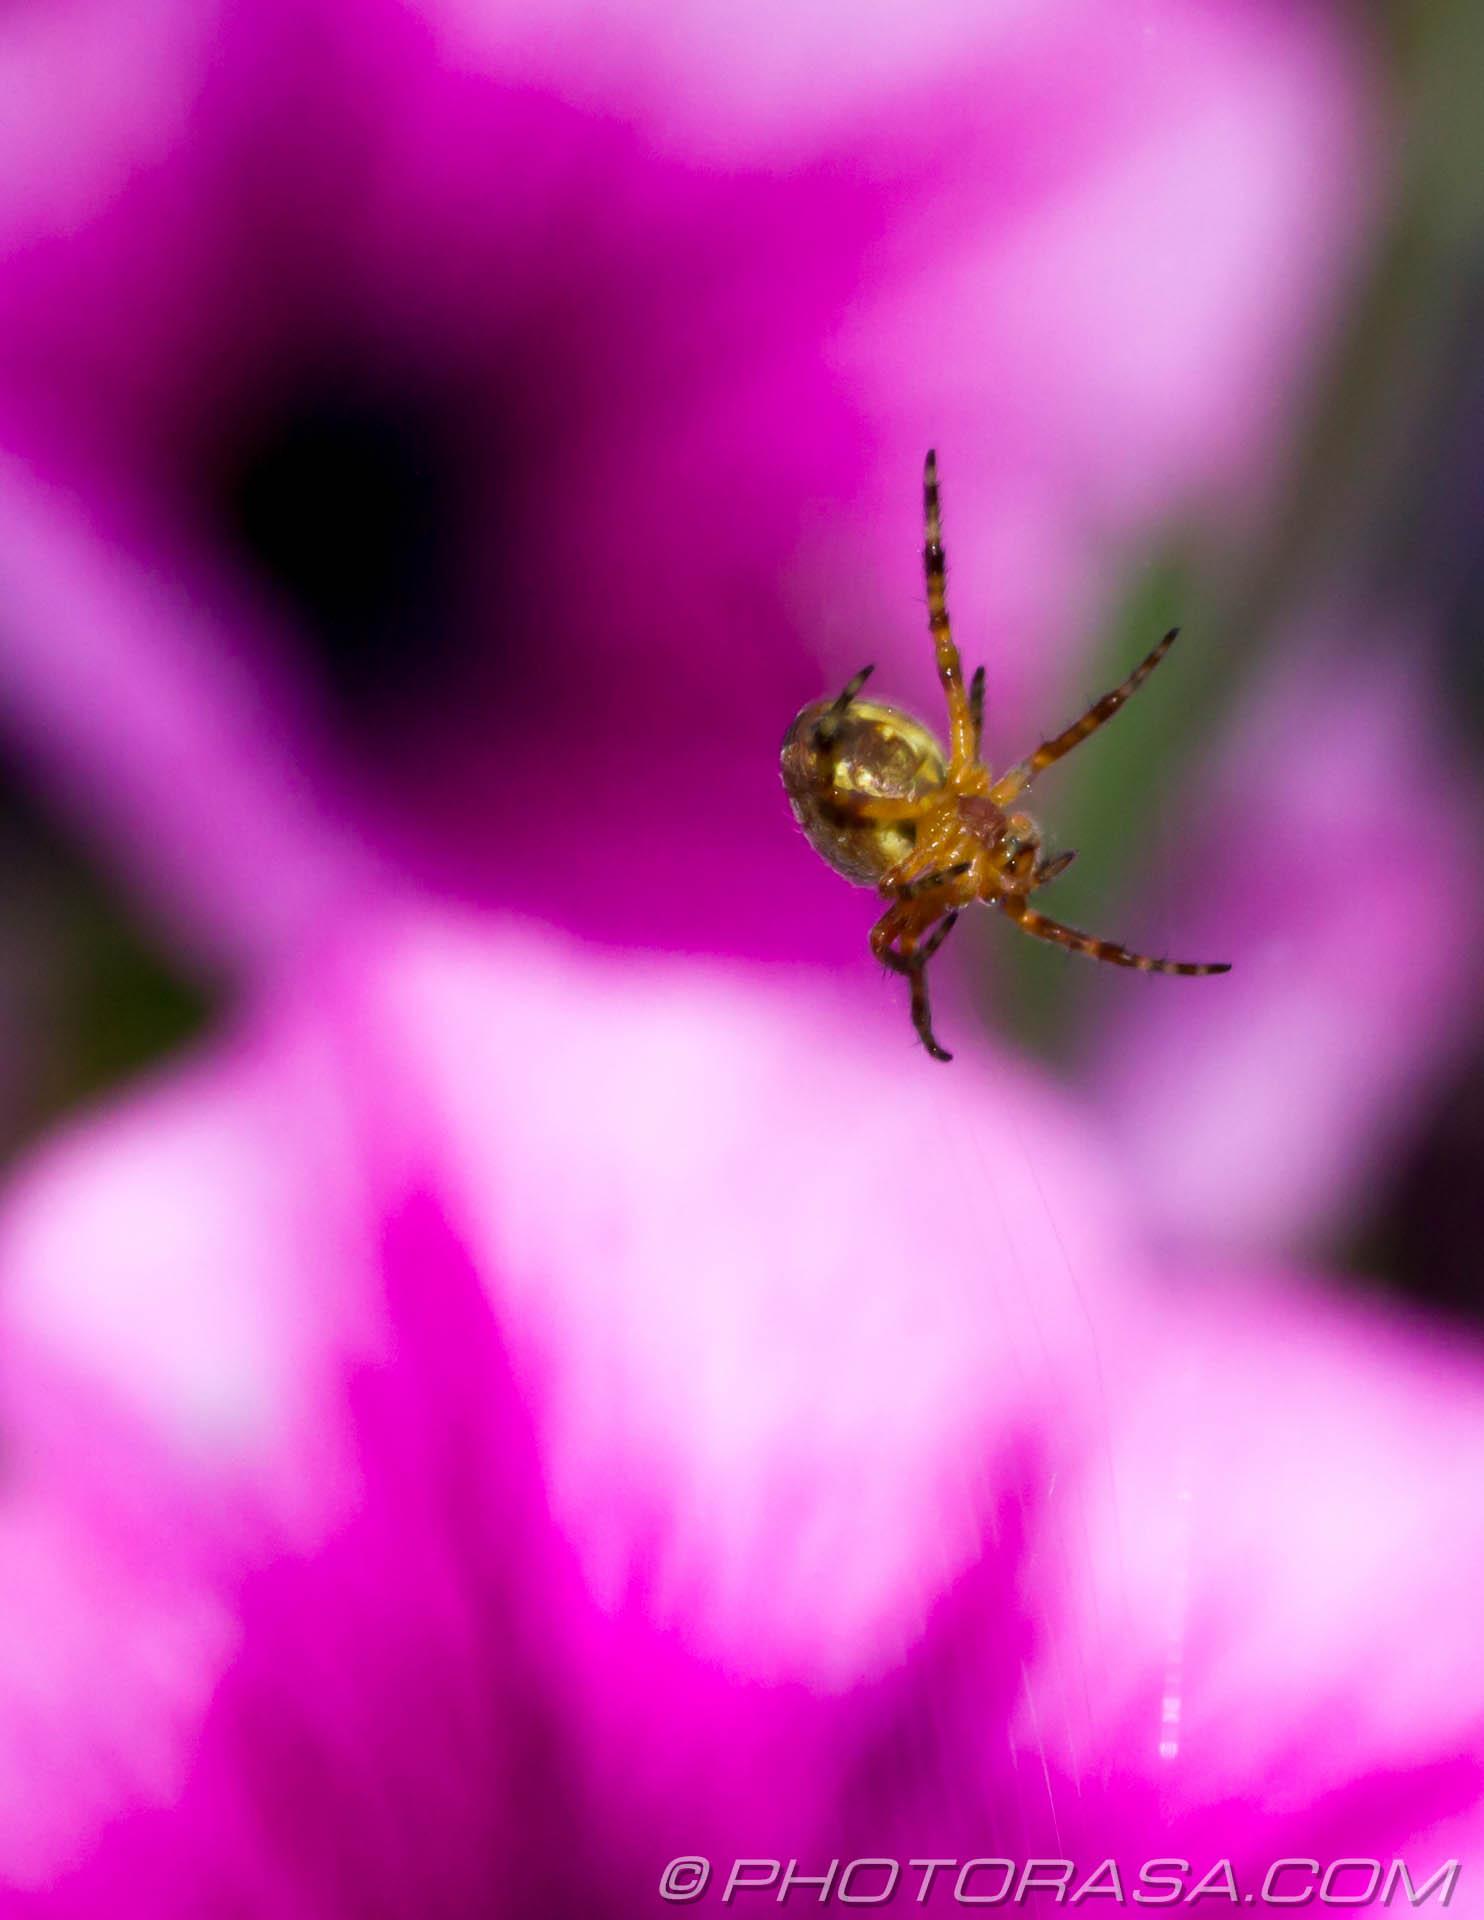 http://photorasa.com/spider-petunias/stradling-the-lines/